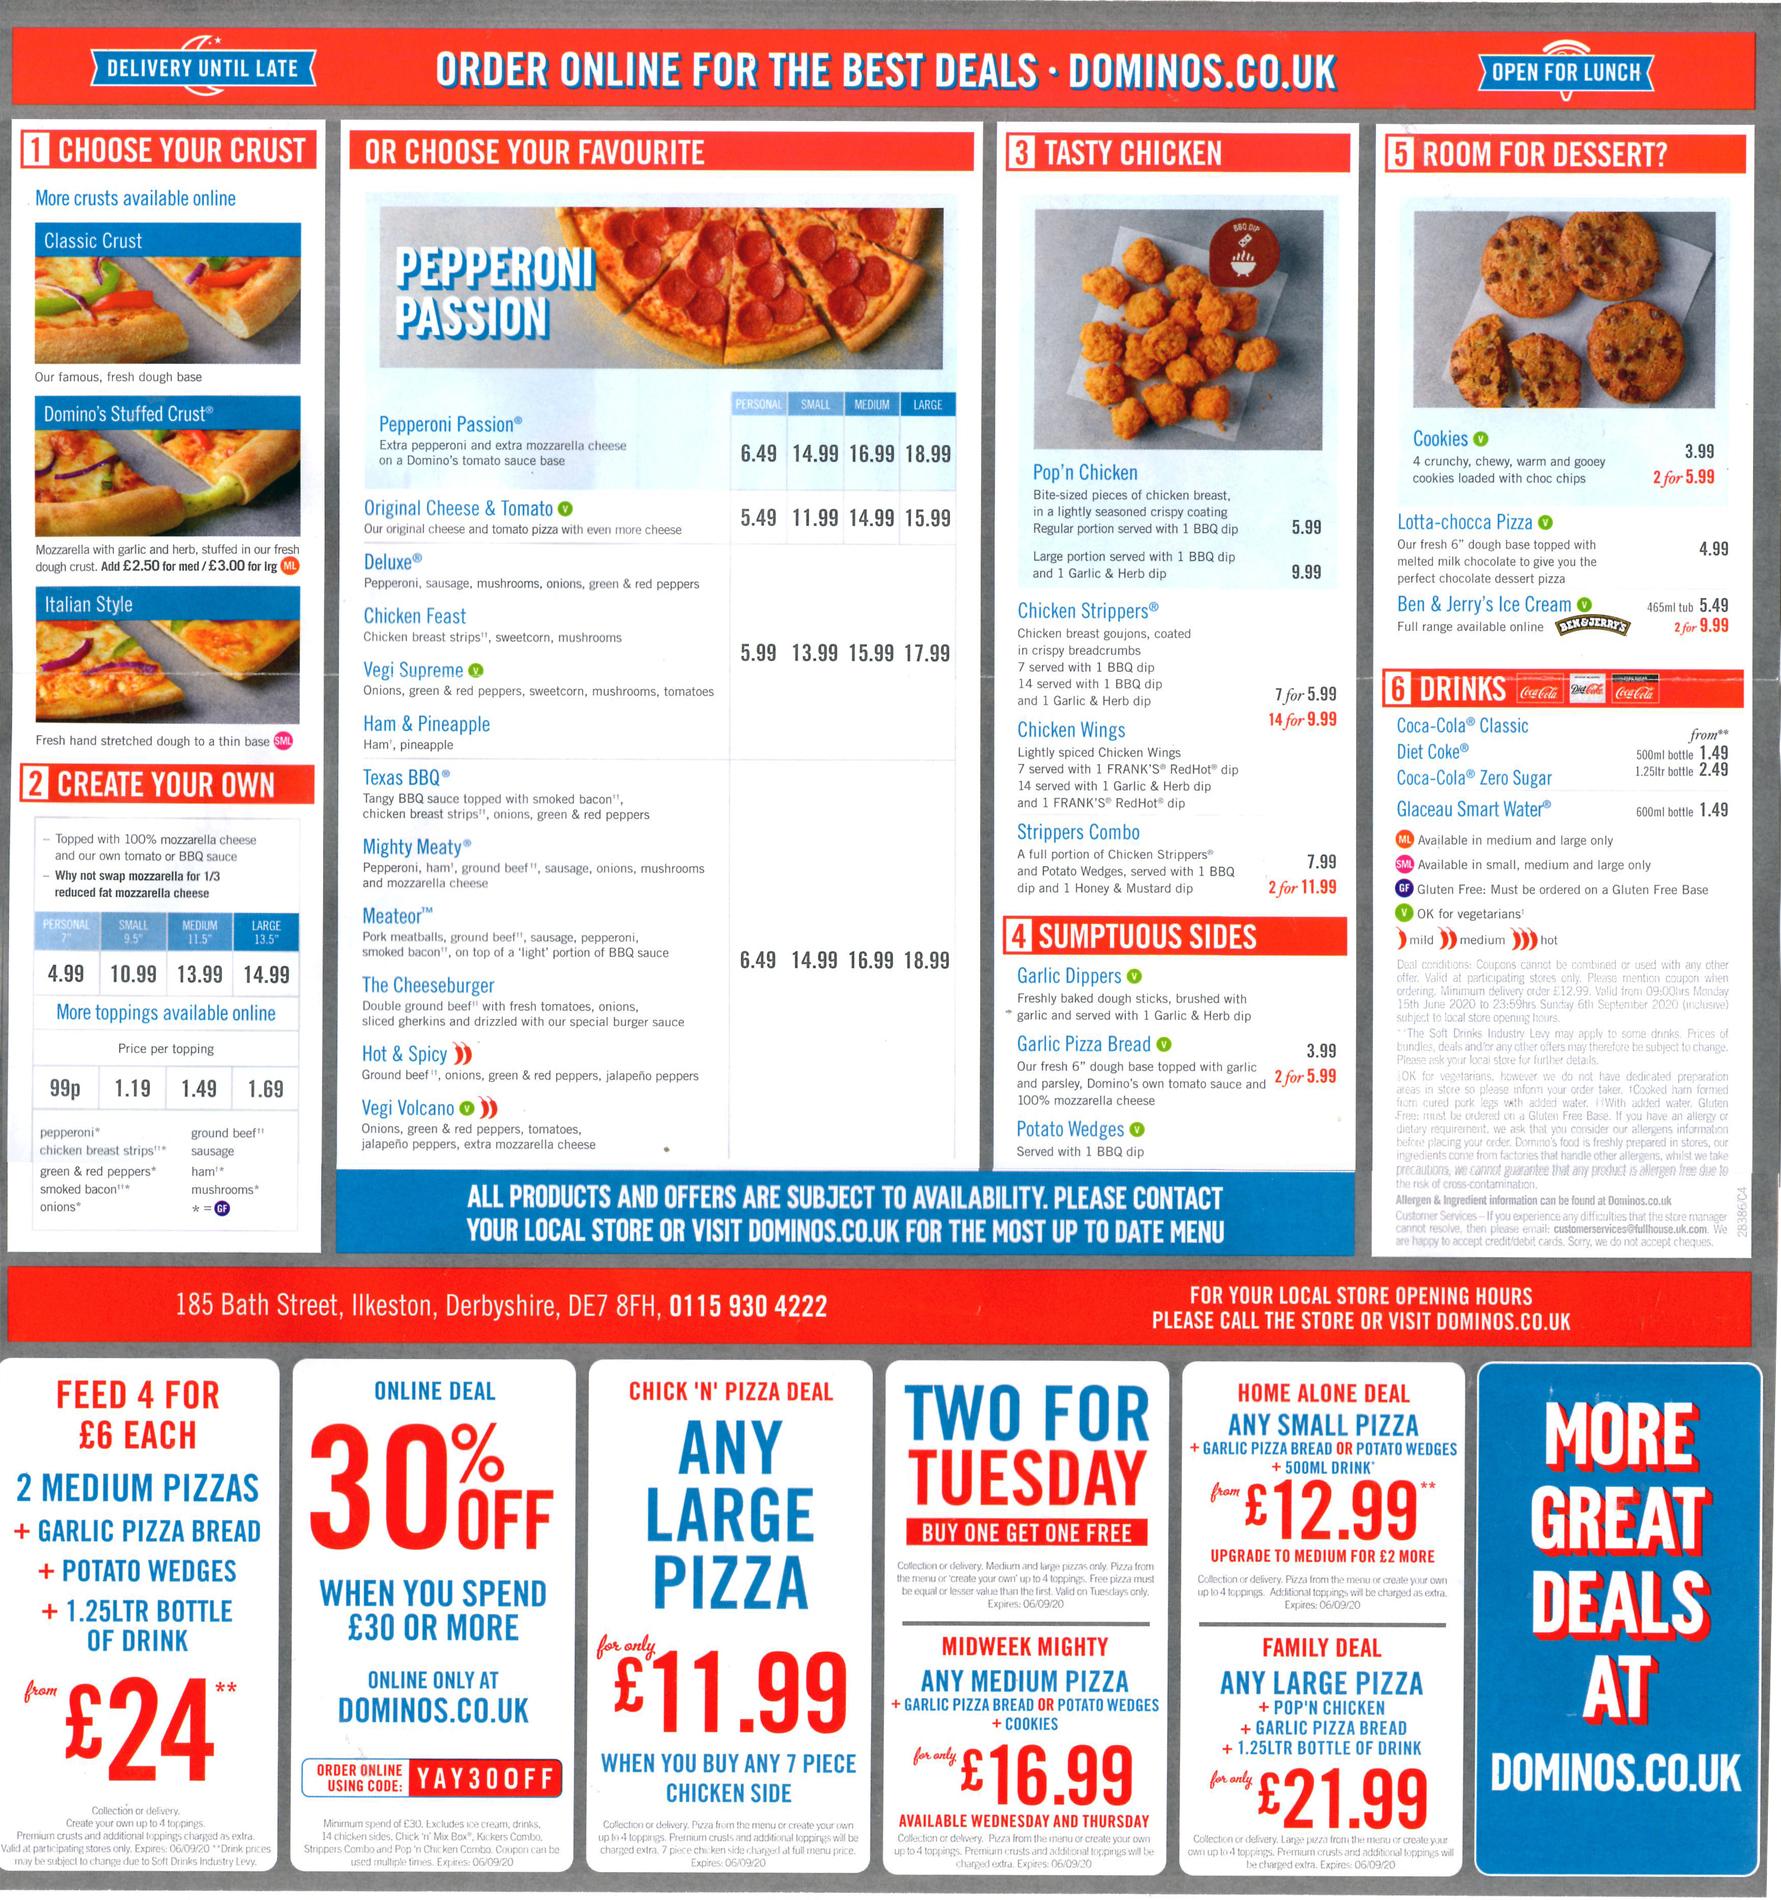 Dominos Nutritional Info Sandwich